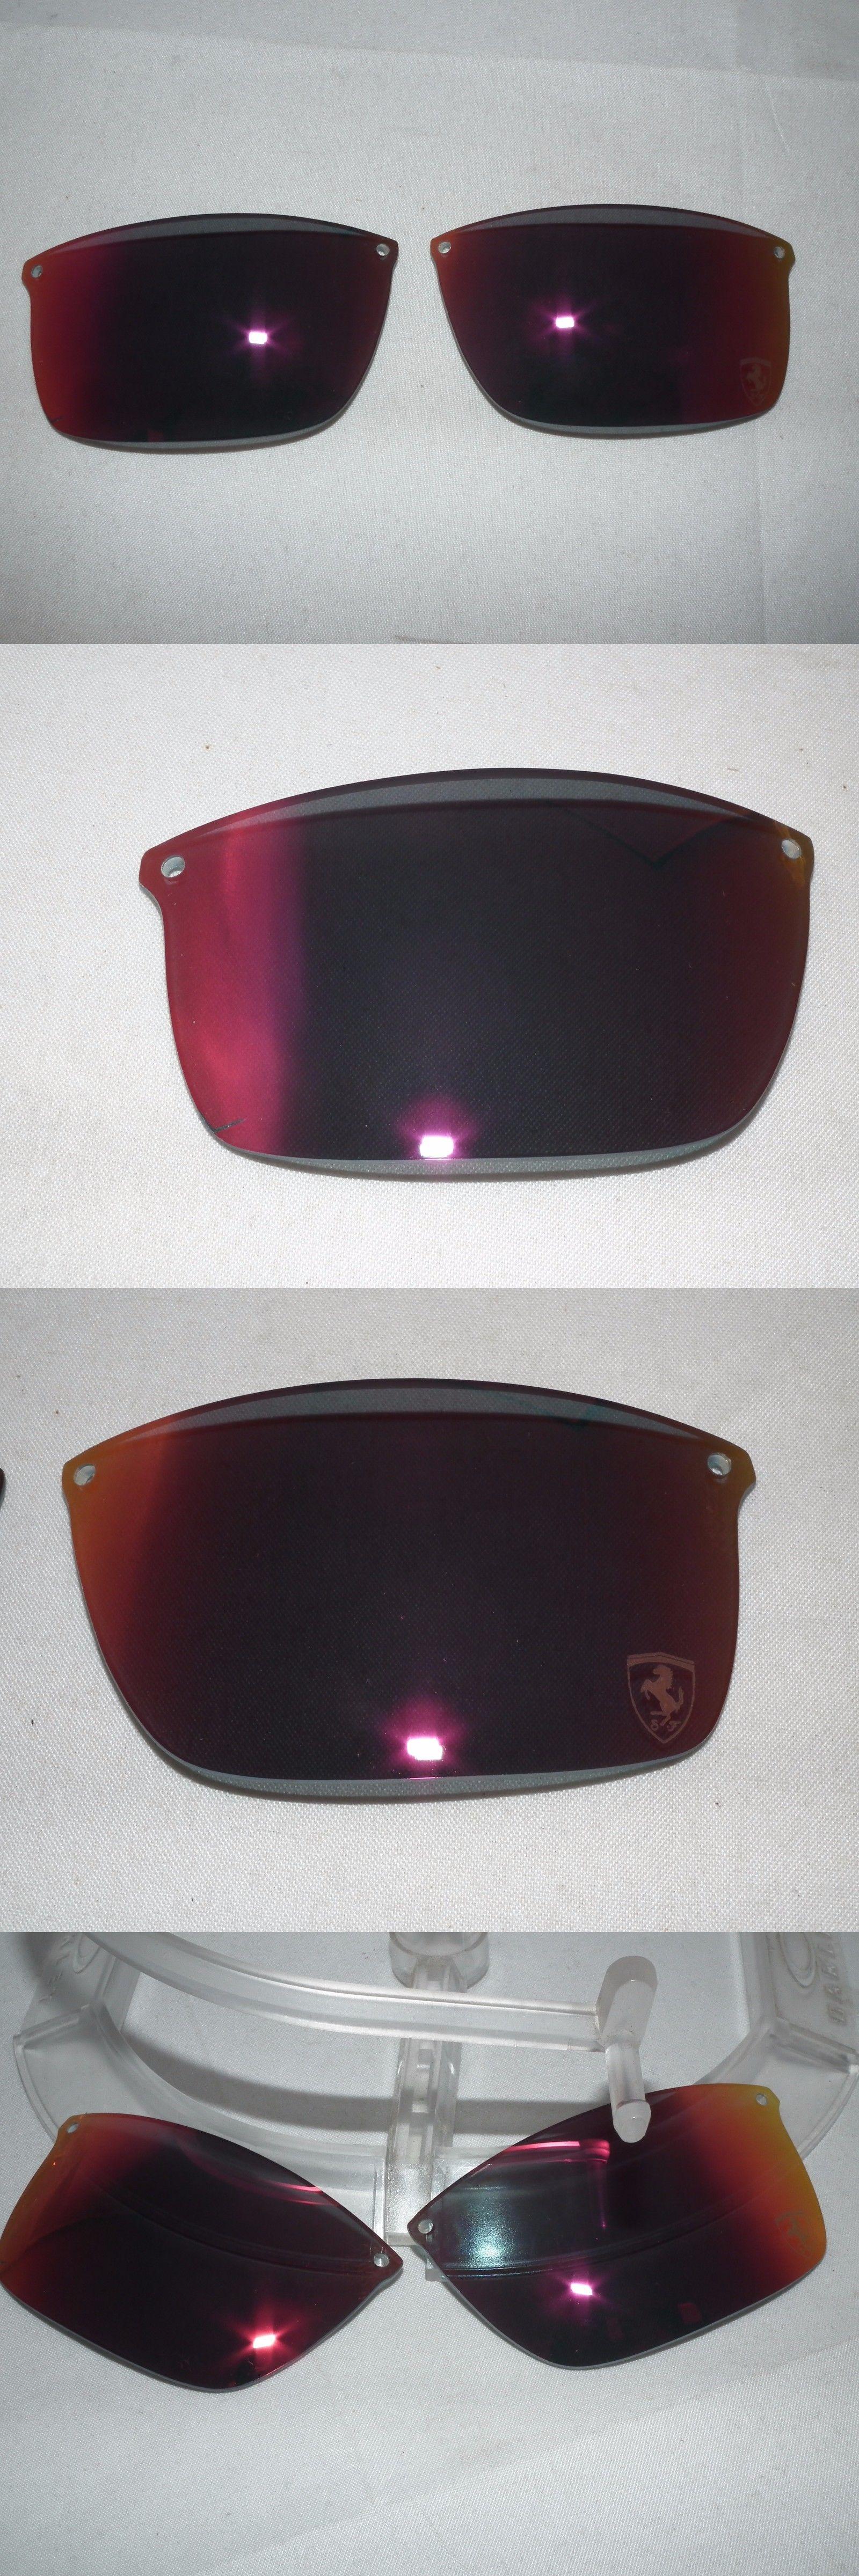 7670e5602e3 Sunglass Lens Replacements 179194  Authentic Oakley Carbon Blade  Replacement Lenses Polarized Ruby Iridium Ferrari -